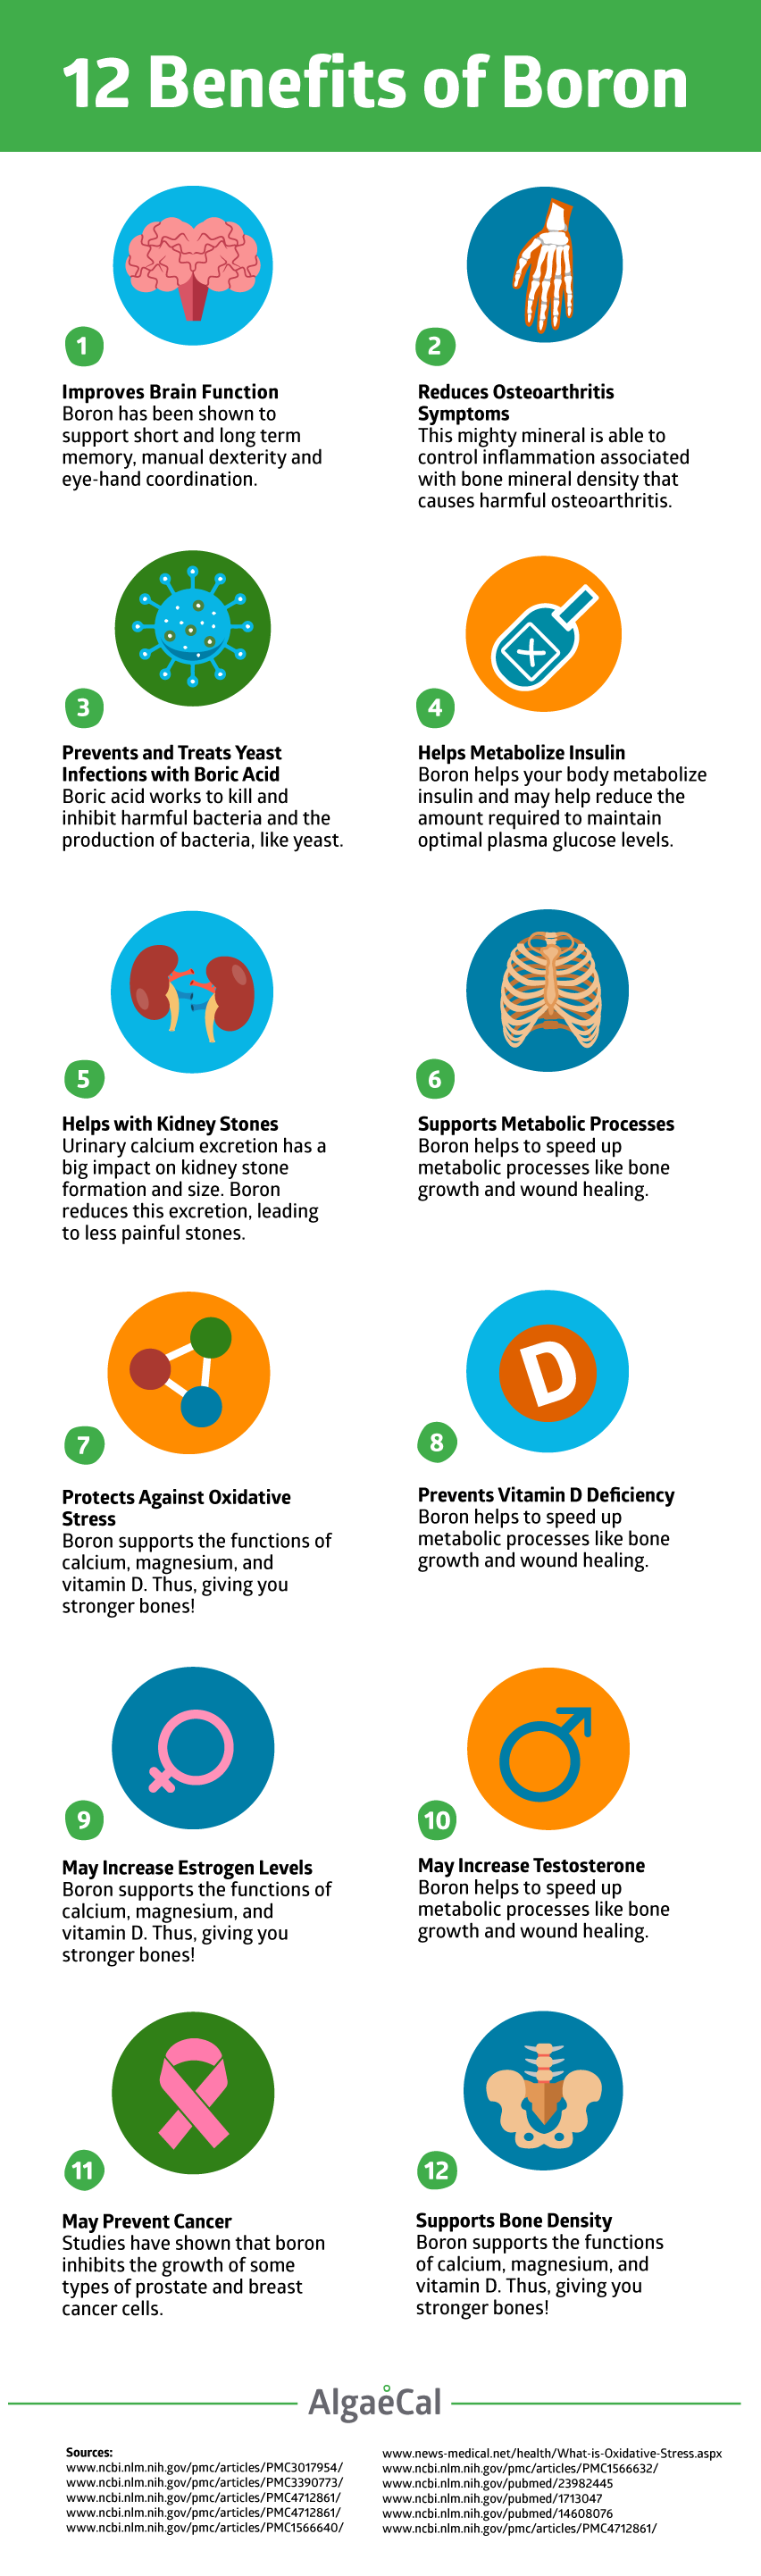 Top Health Benefits of Boron